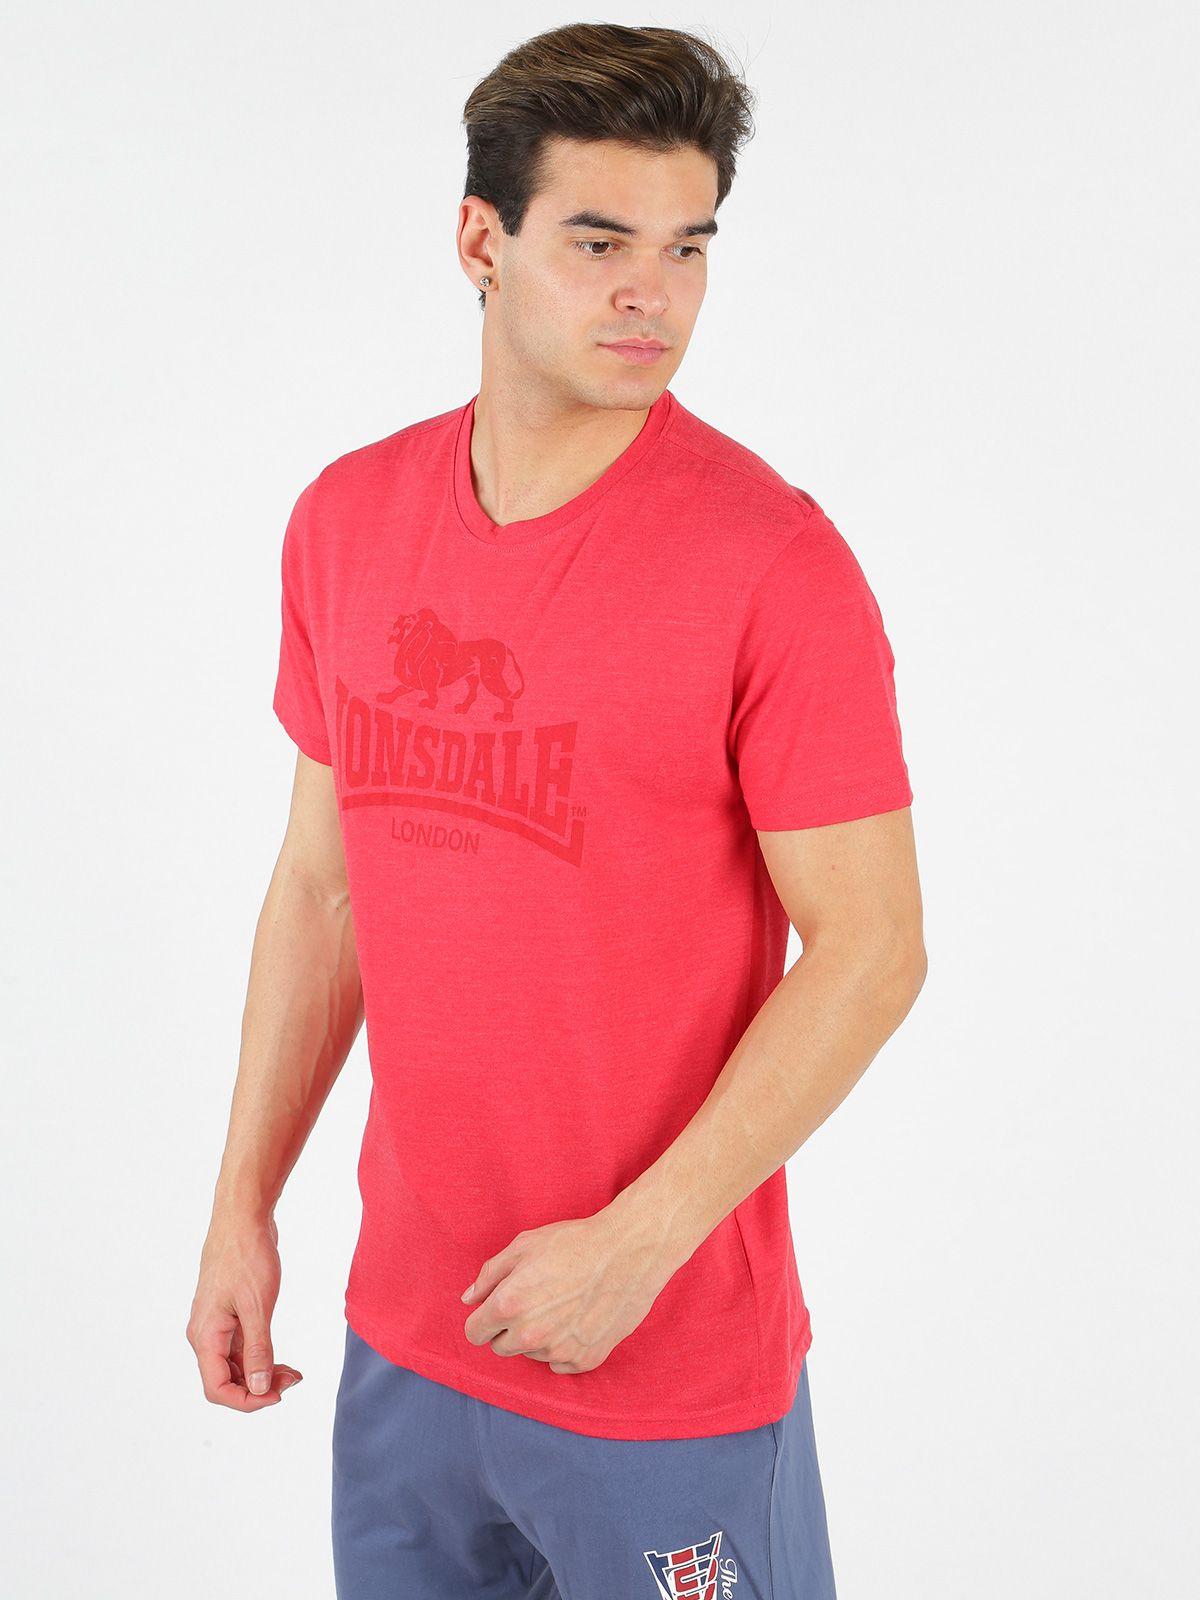 Stampa Davanti shirt Con Sul Cotone Arancione T Uomo Mecshopping XnwOP80k